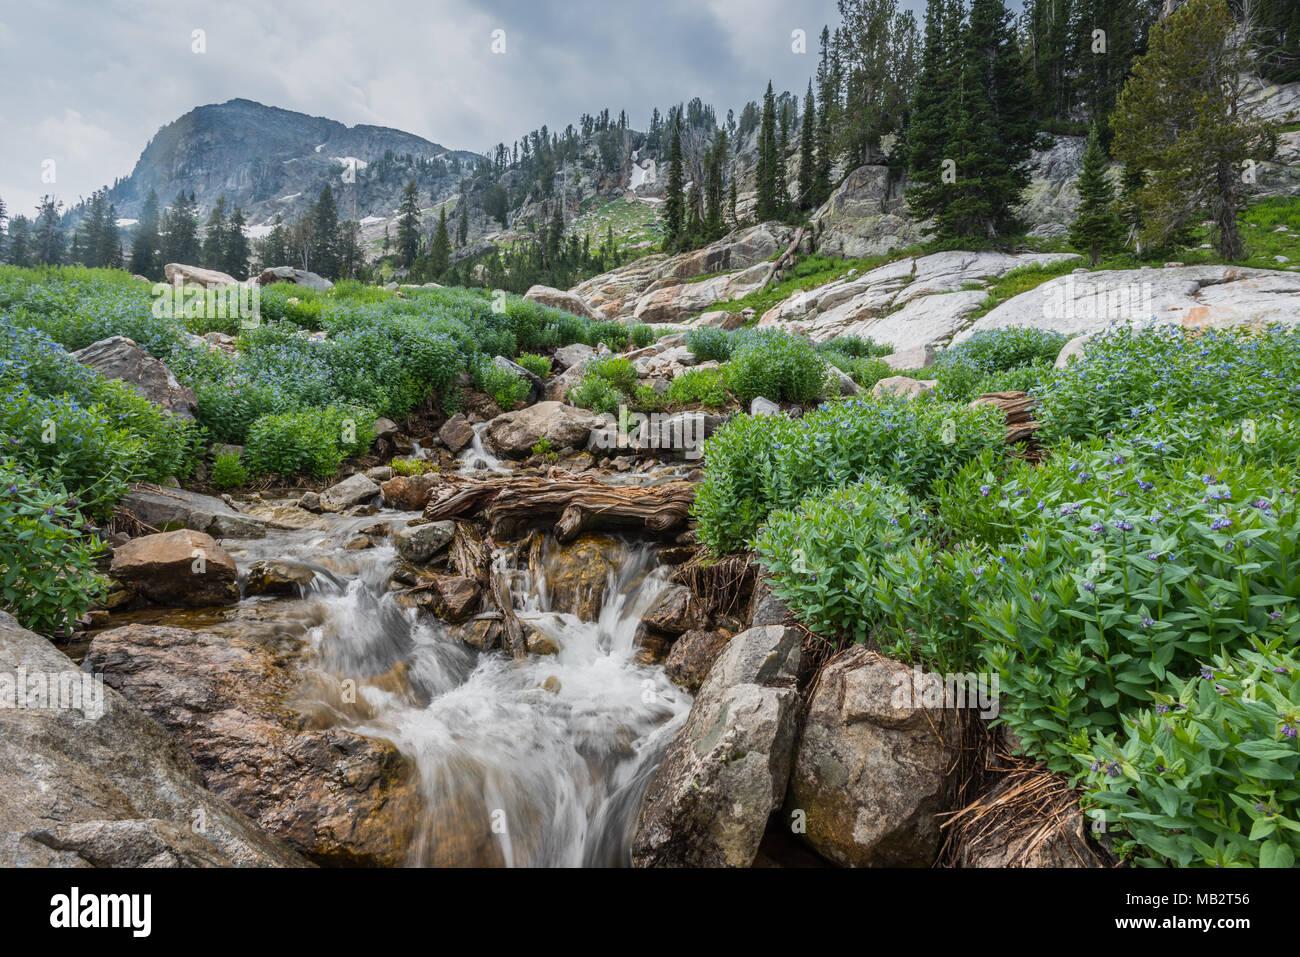 Water Flows Through Spring Flowers in Grand Teton National Park - Stock Image